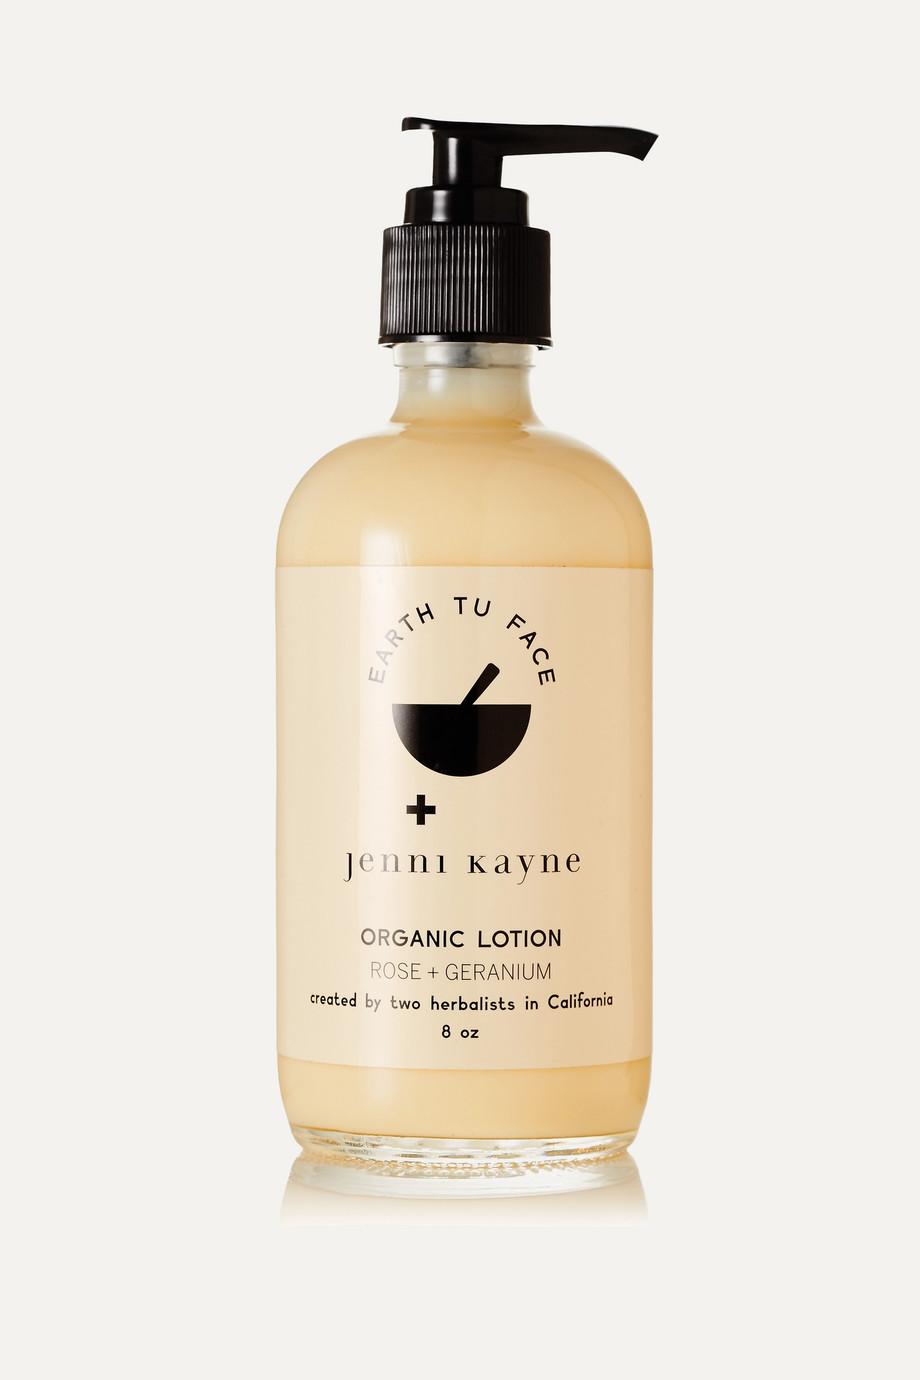 Earth Tu Face + Jenni Kayne Organic Lotion, 236ml